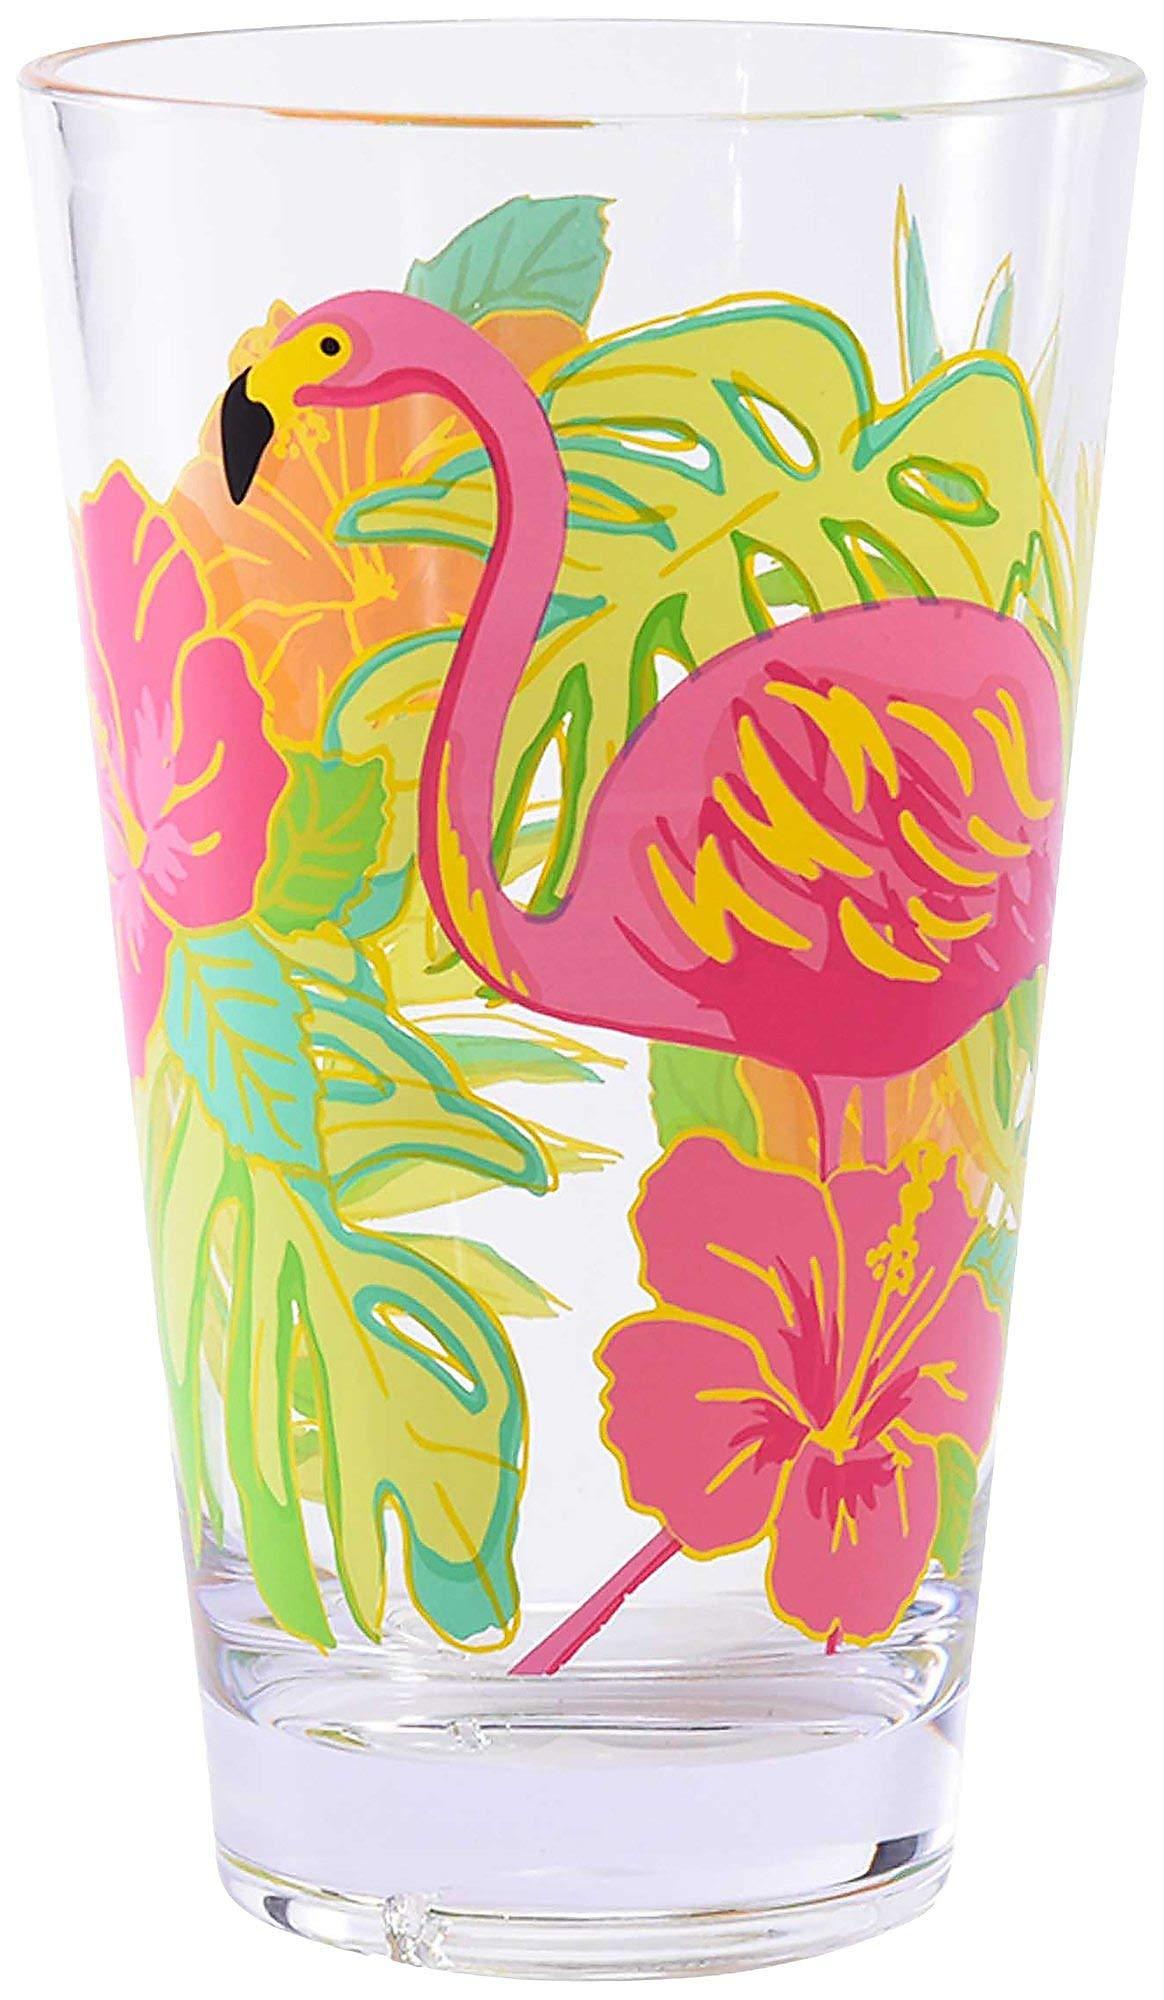 Coastal Home Flamingo Hibiscus Highball Glass One Size Green/pink